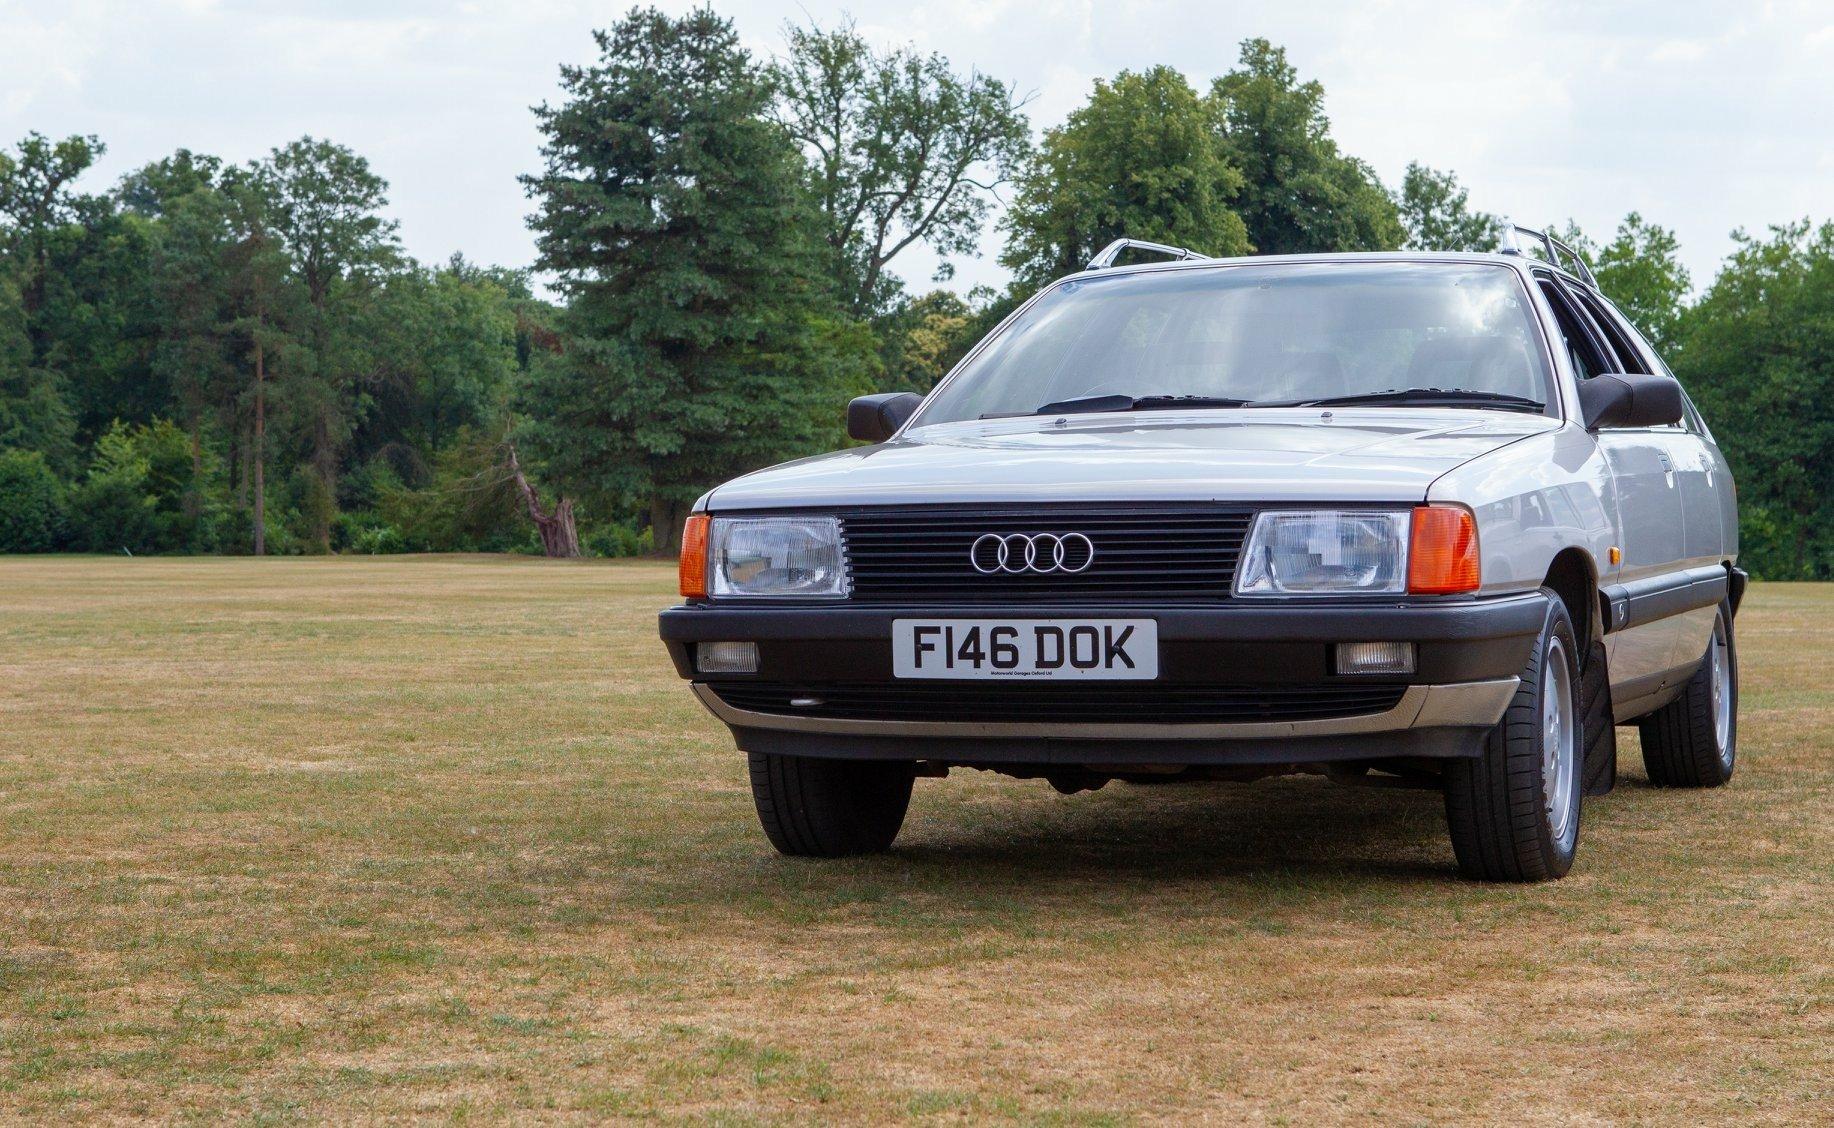 1989 Audi 100 2.0e Avant SOLD | Car and Classic